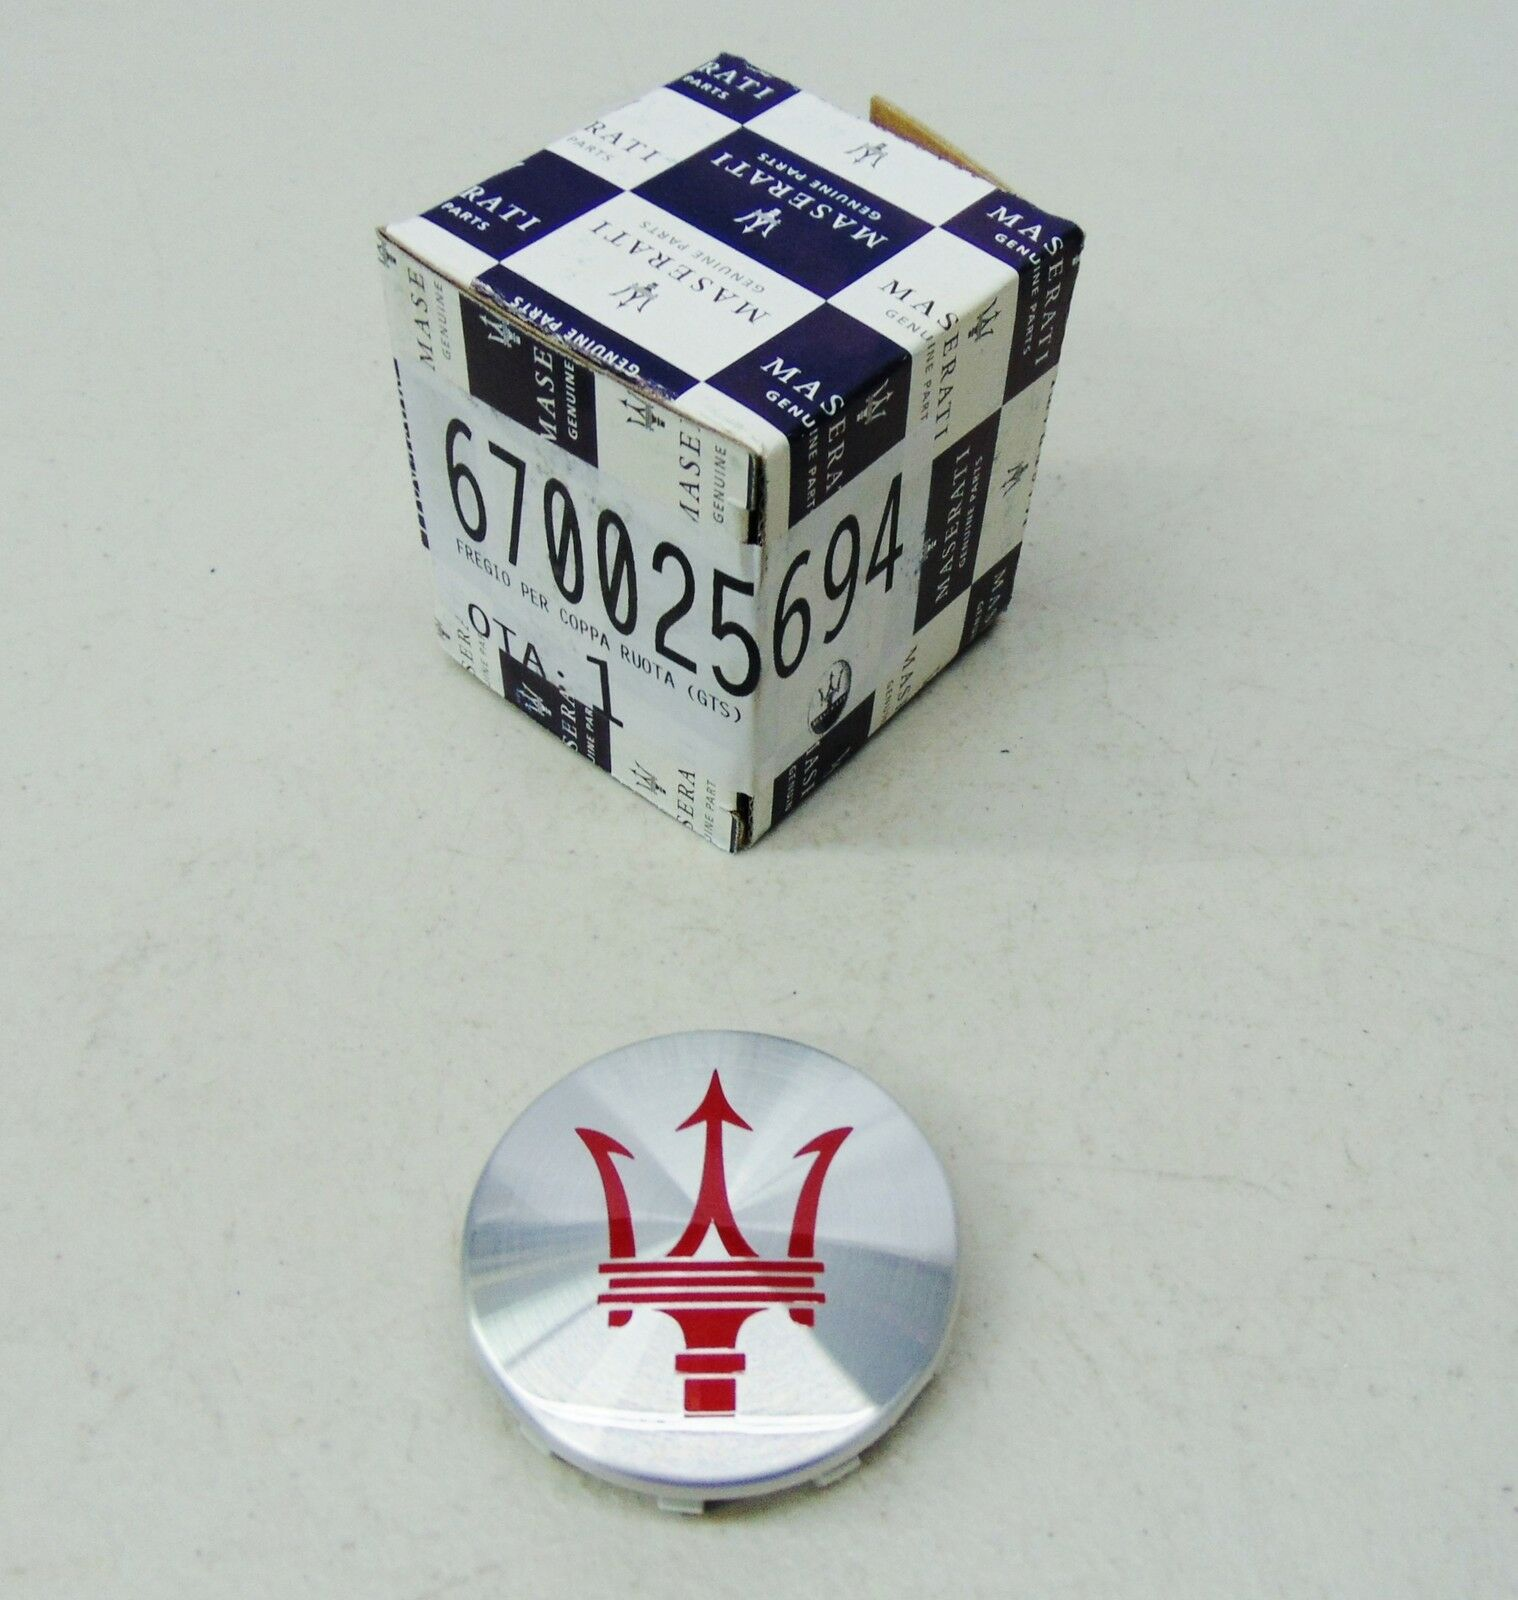 MASERATI QP & GHIBLI GTS SILVER W/ RED WHEEL CENTER CAP 670025694